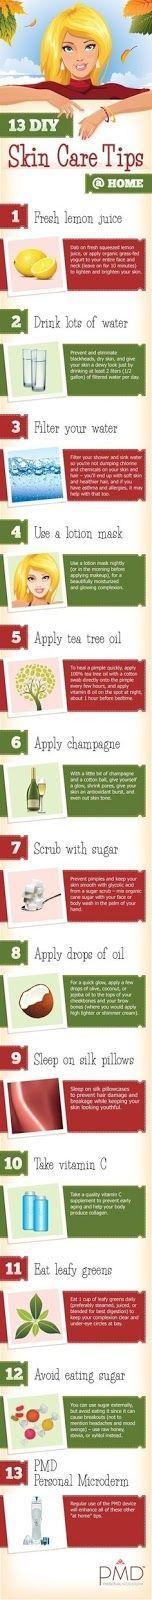 Skinny Diva Beauty: Infographic: 13 DIY Skin Care Tips @ Home